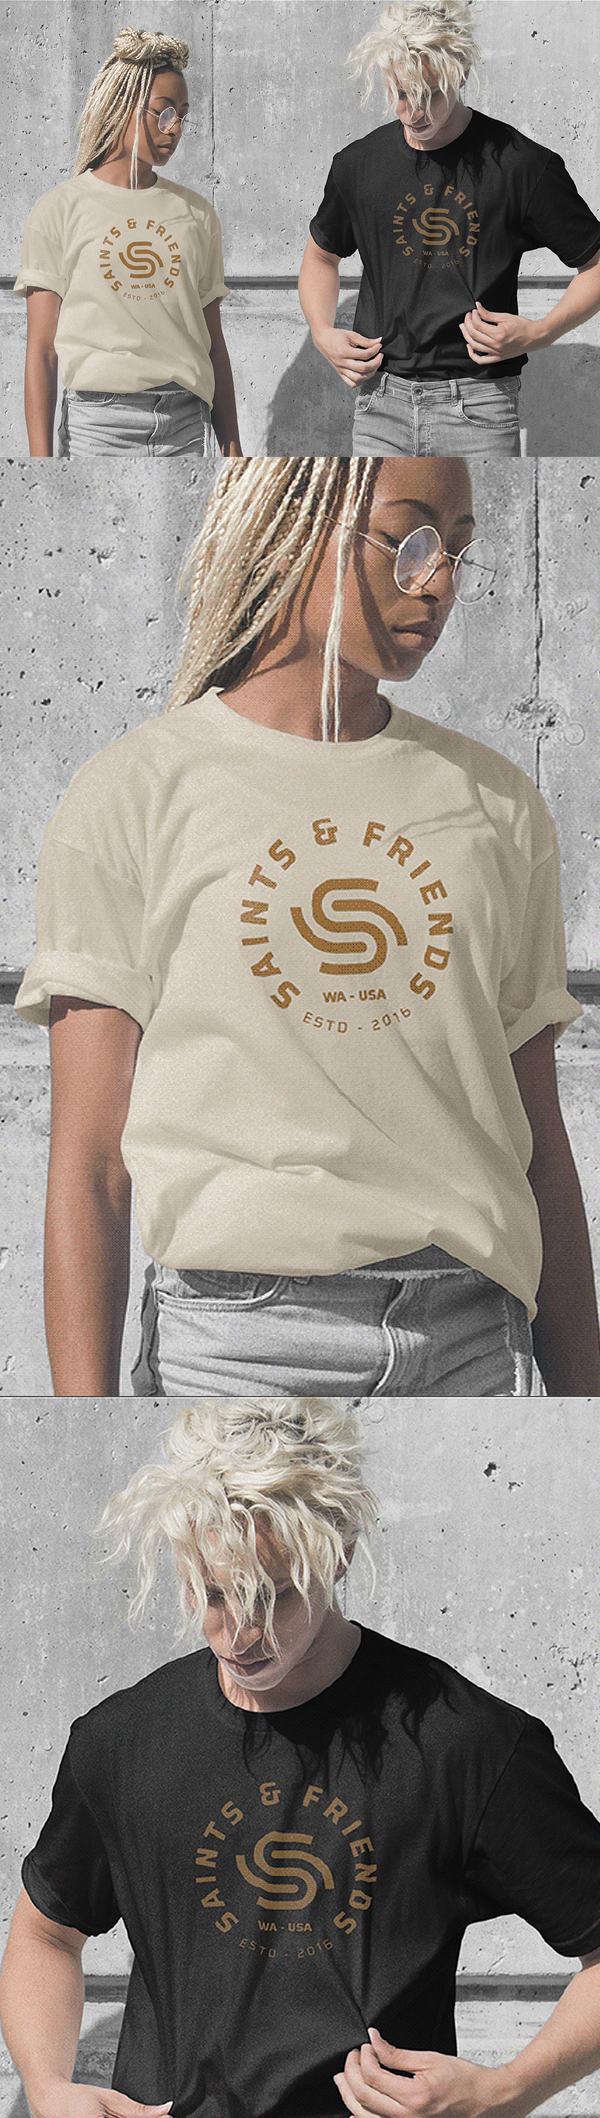 Free T-Shirts PSD Mockup